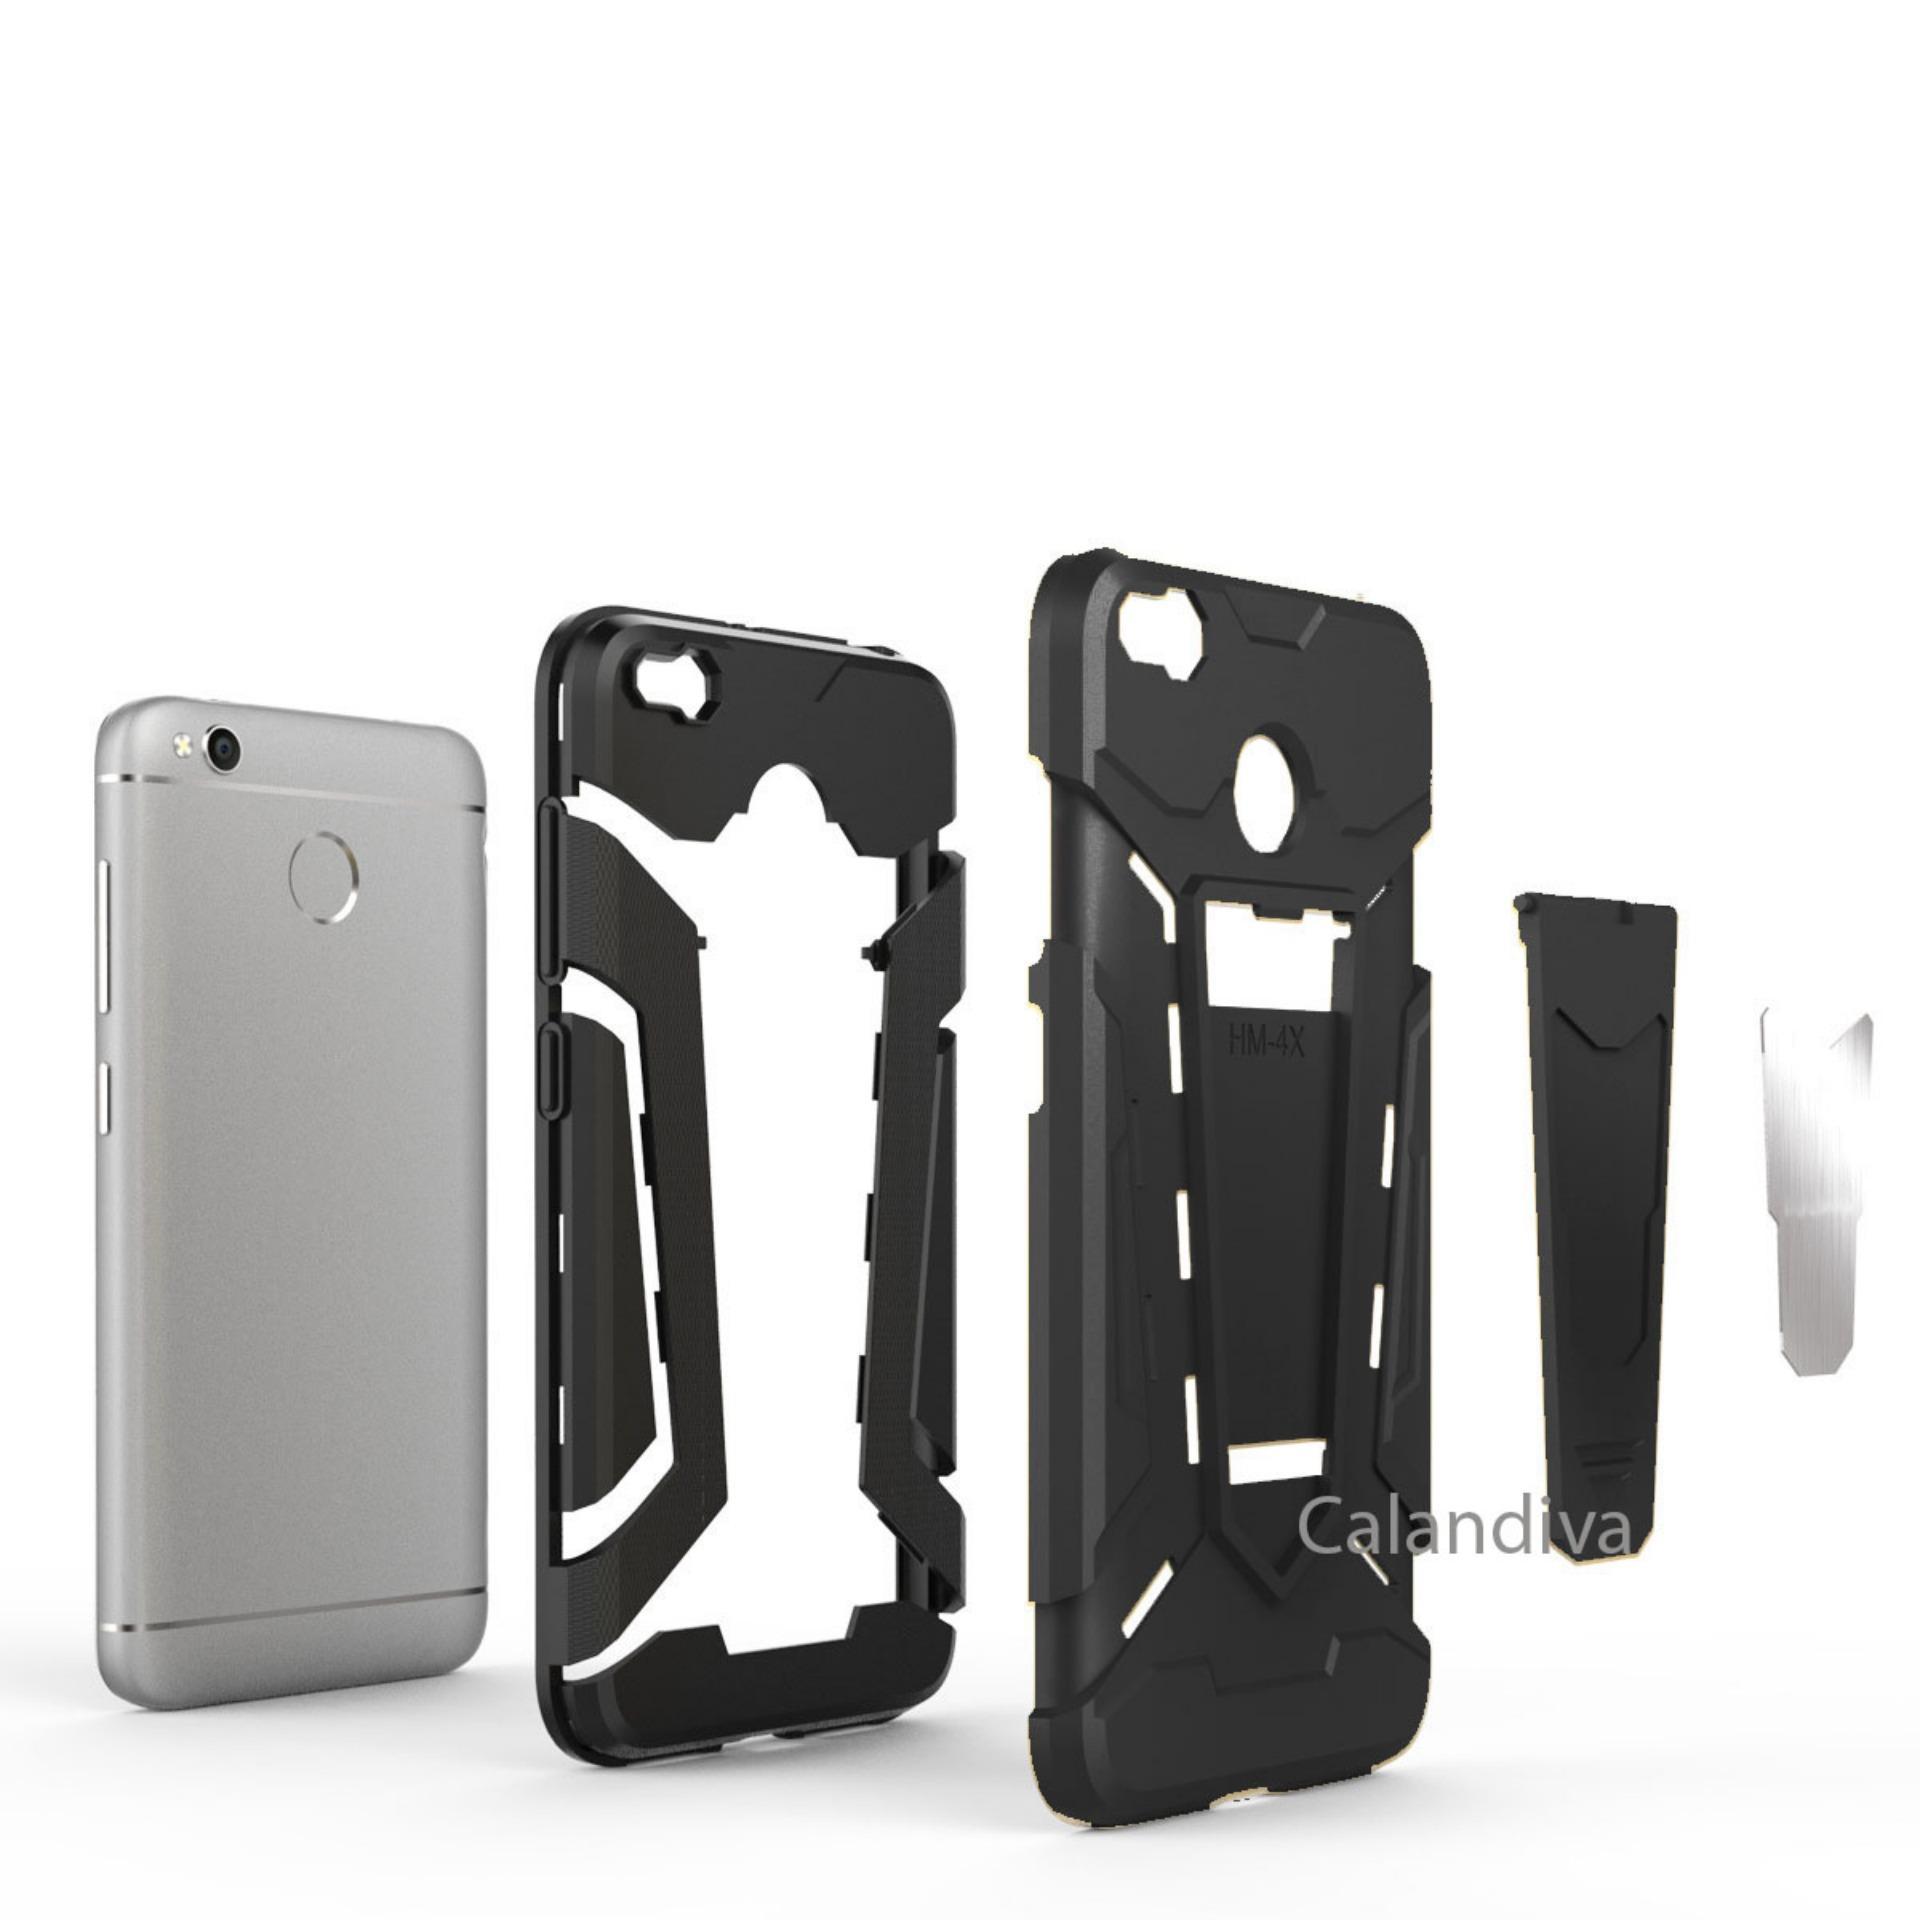 Calandiva Transformer Kickstand Slim Armor Hardcase for Xiaomi Redmi 4X / Redmi 4X .